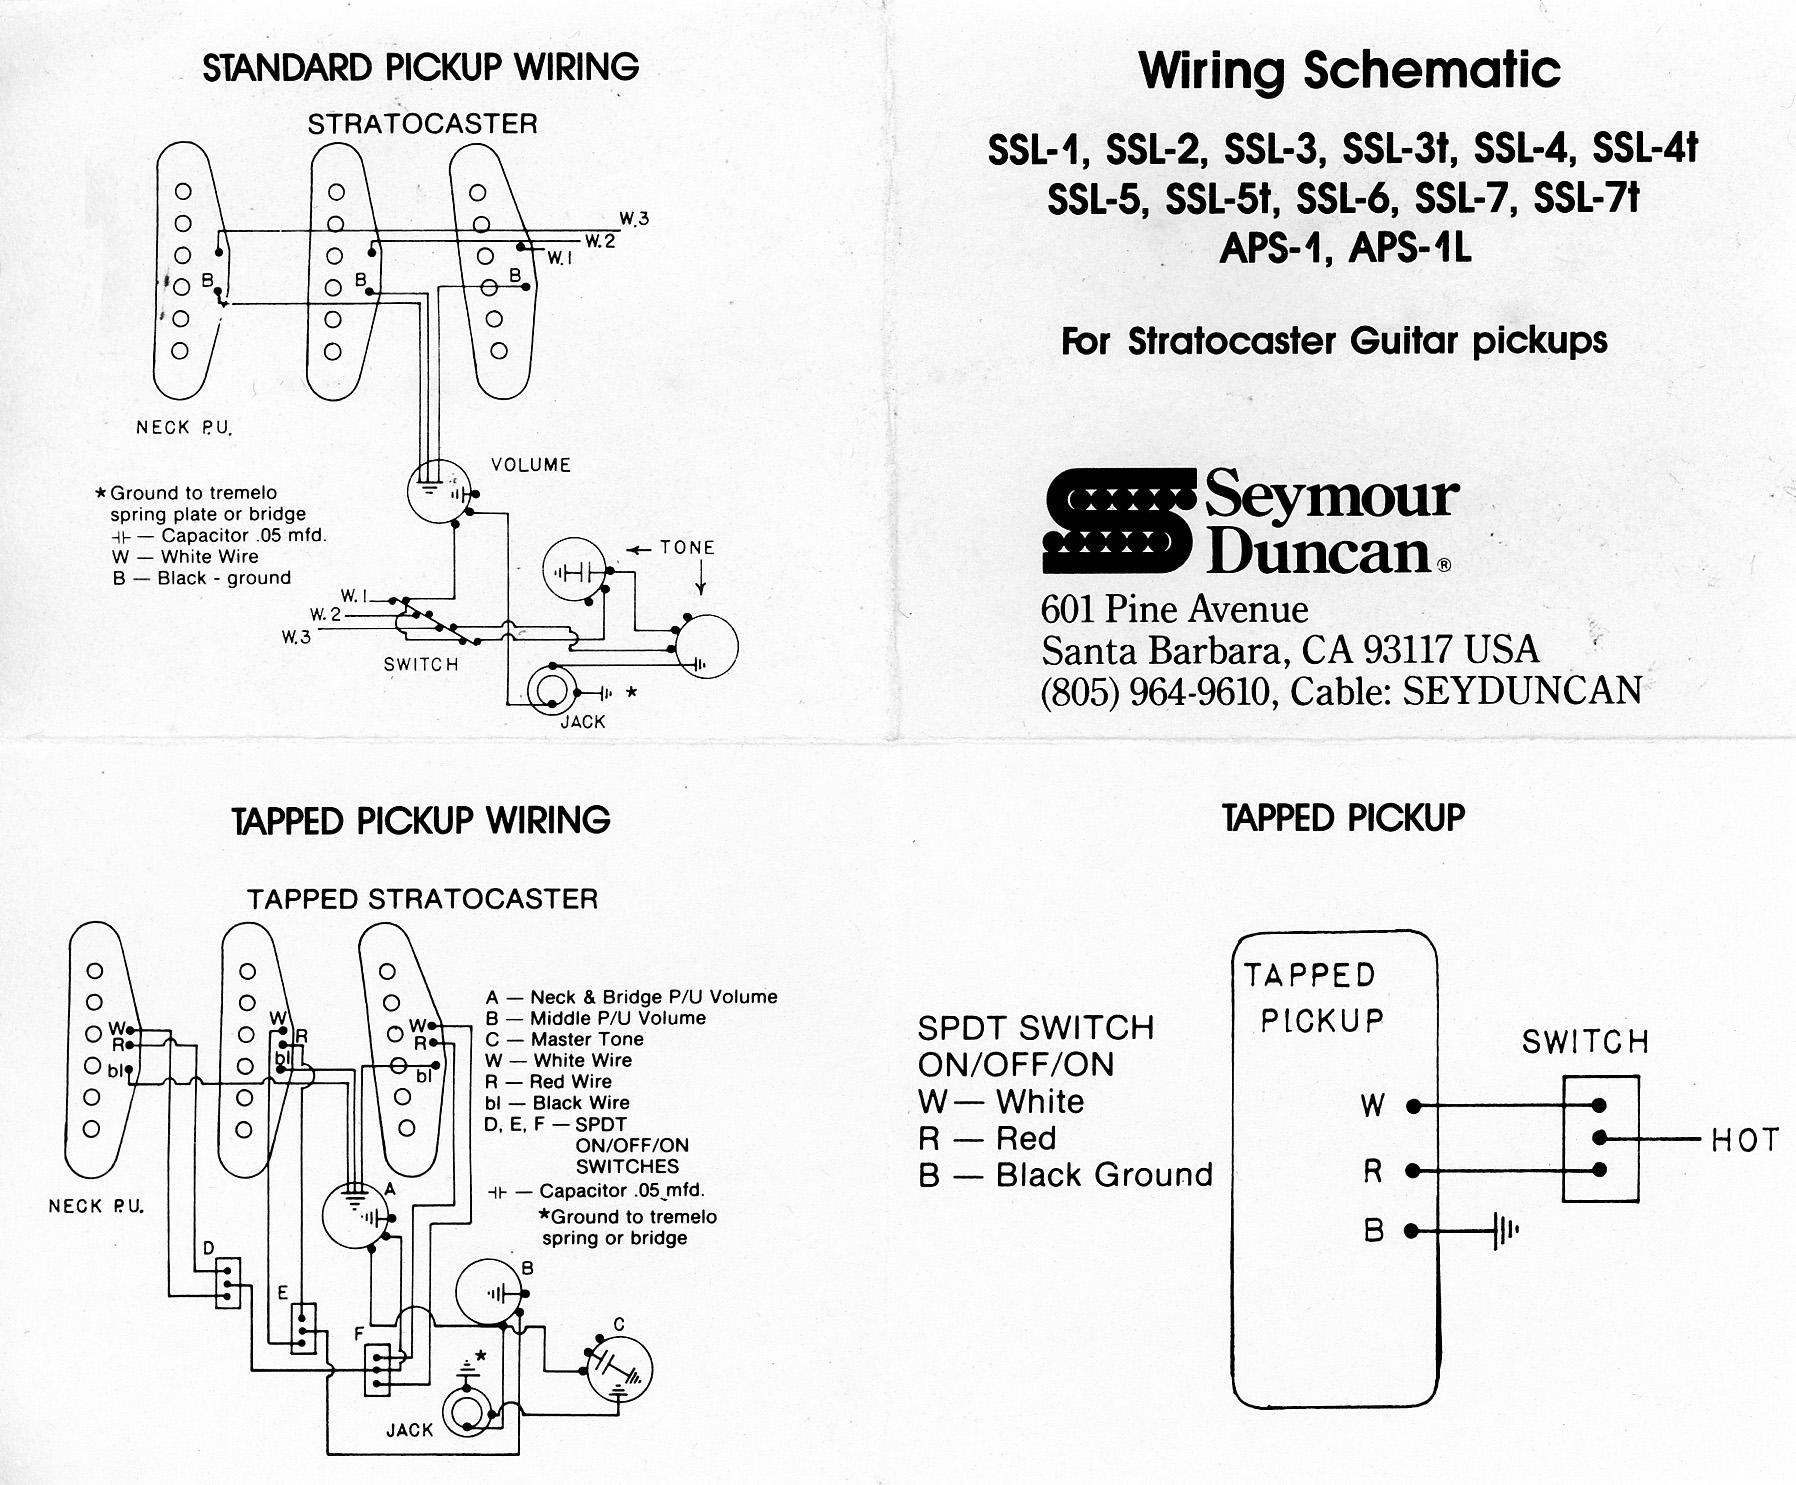 [FPER_4992]  DIAGRAM] Wiring Diagram Seymour Duncan Ssl 5 FULL Version HD Quality Ssl 5  - CARRYBOYPHIL.K-DANSE.FR | Wiring Diagram Seymour Duncan Ssl 5 |  | K-danse.fr